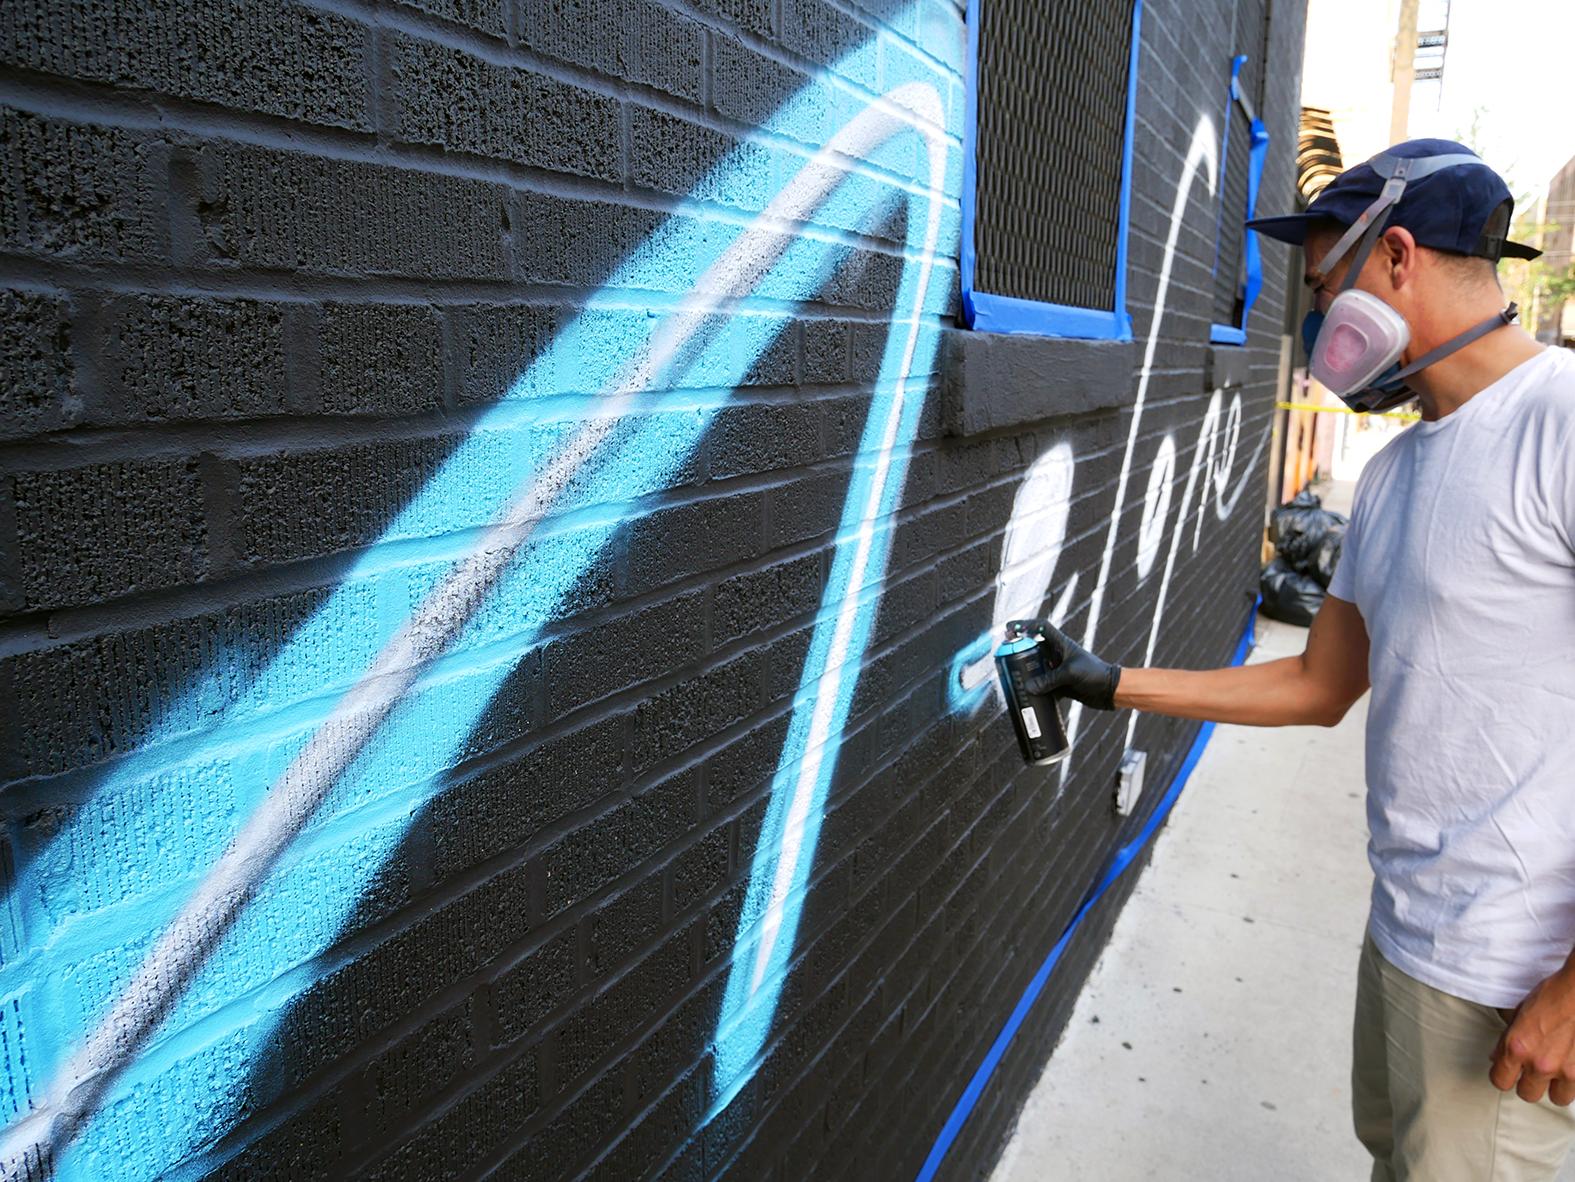 Nerone-street-art-NYC 6